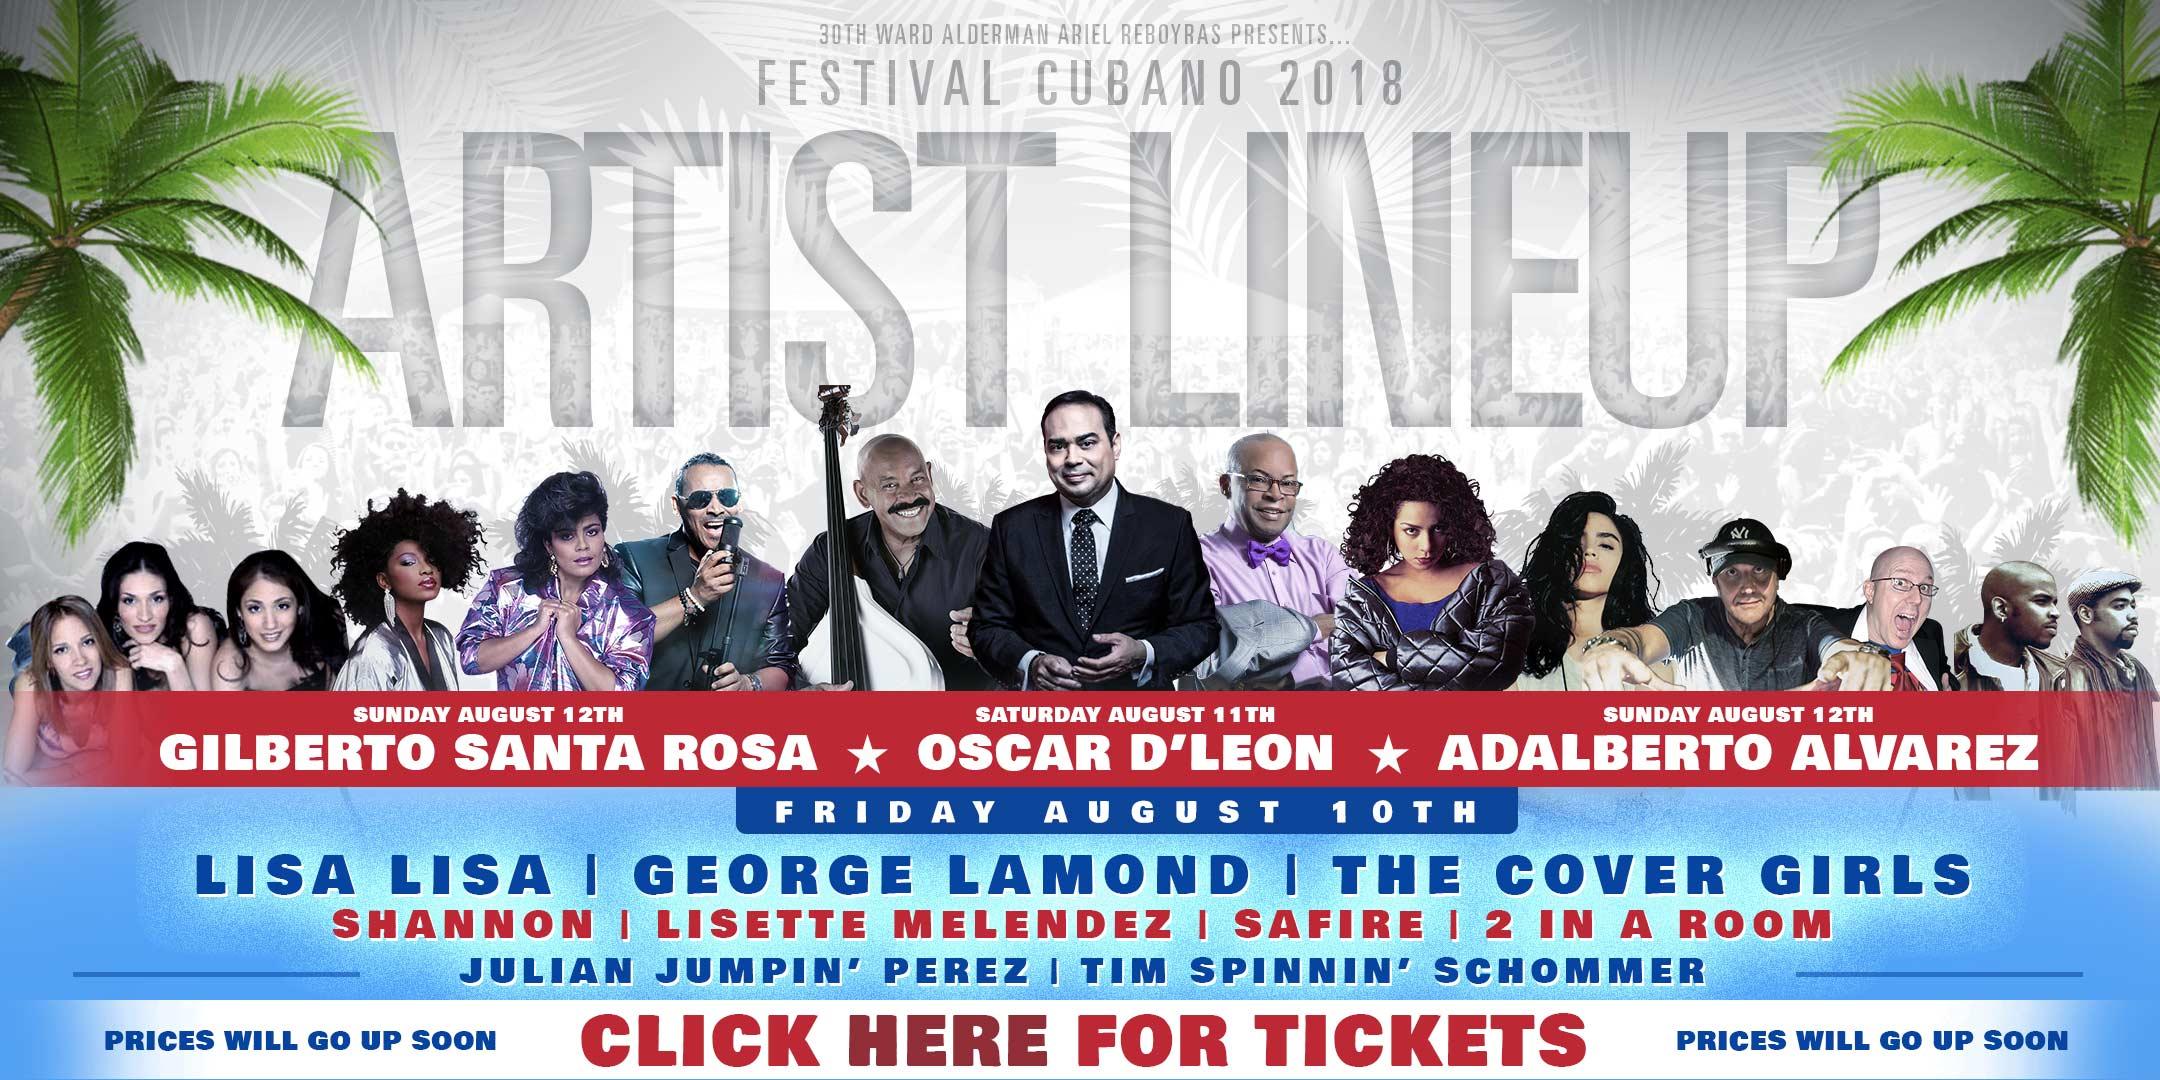 Festival Cubano Chicago 2018 Cuban Fest